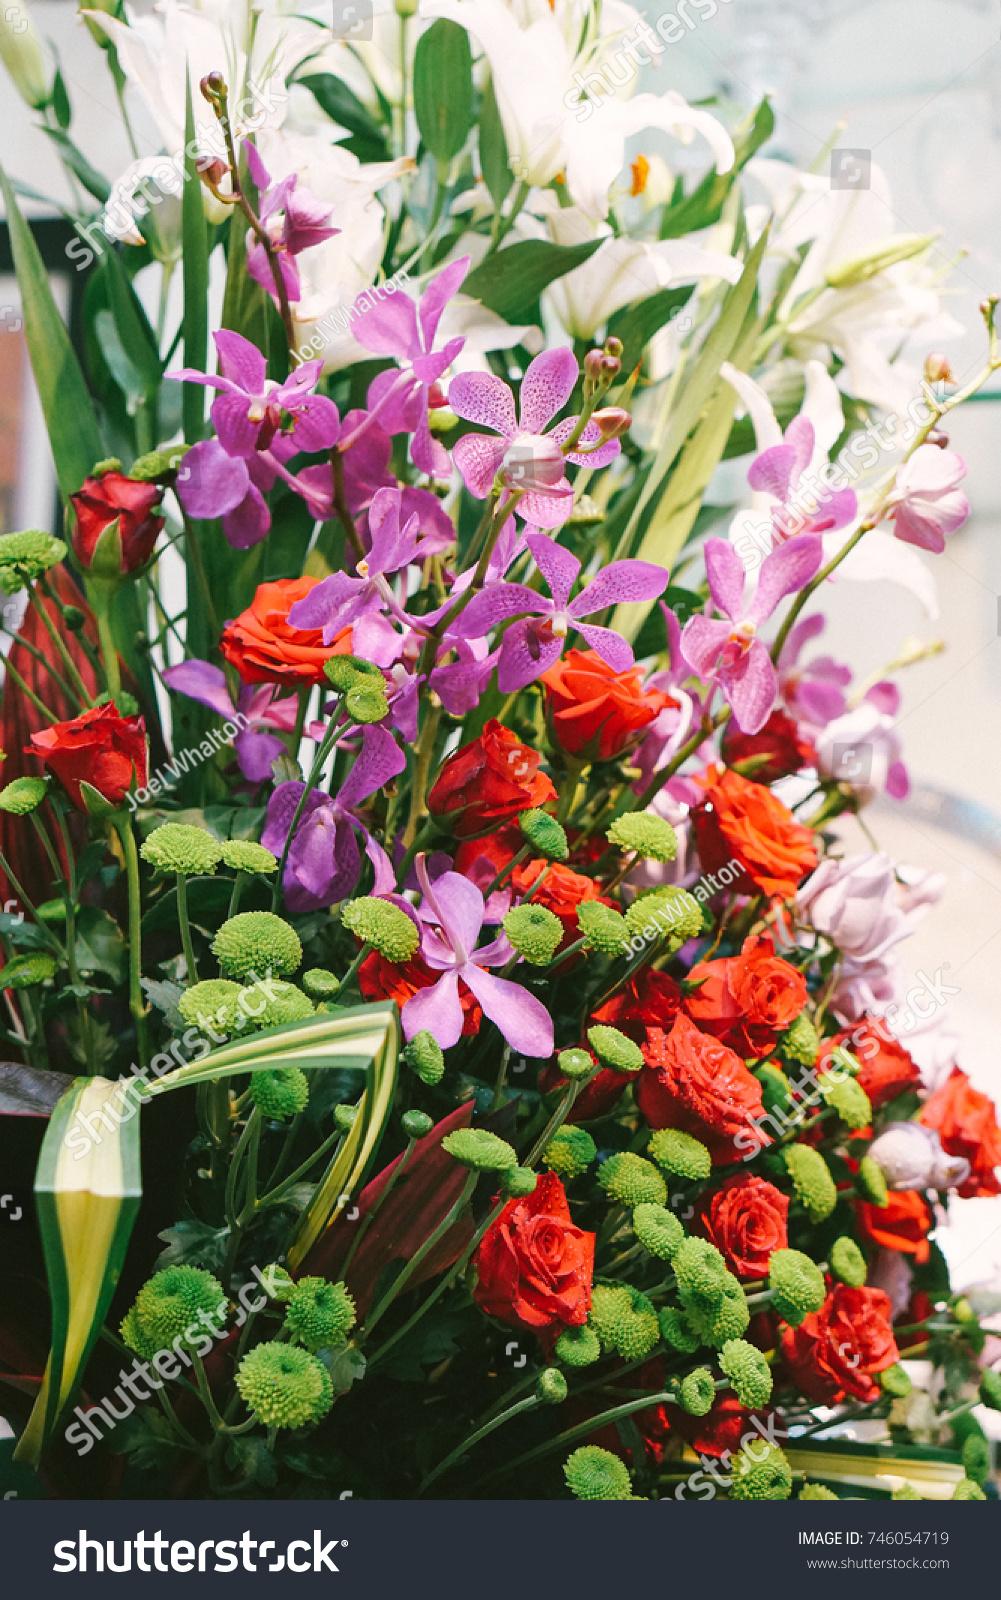 Mixed Flower Bouquet Flower Design Flower Stock Photo (Royalty Free ...